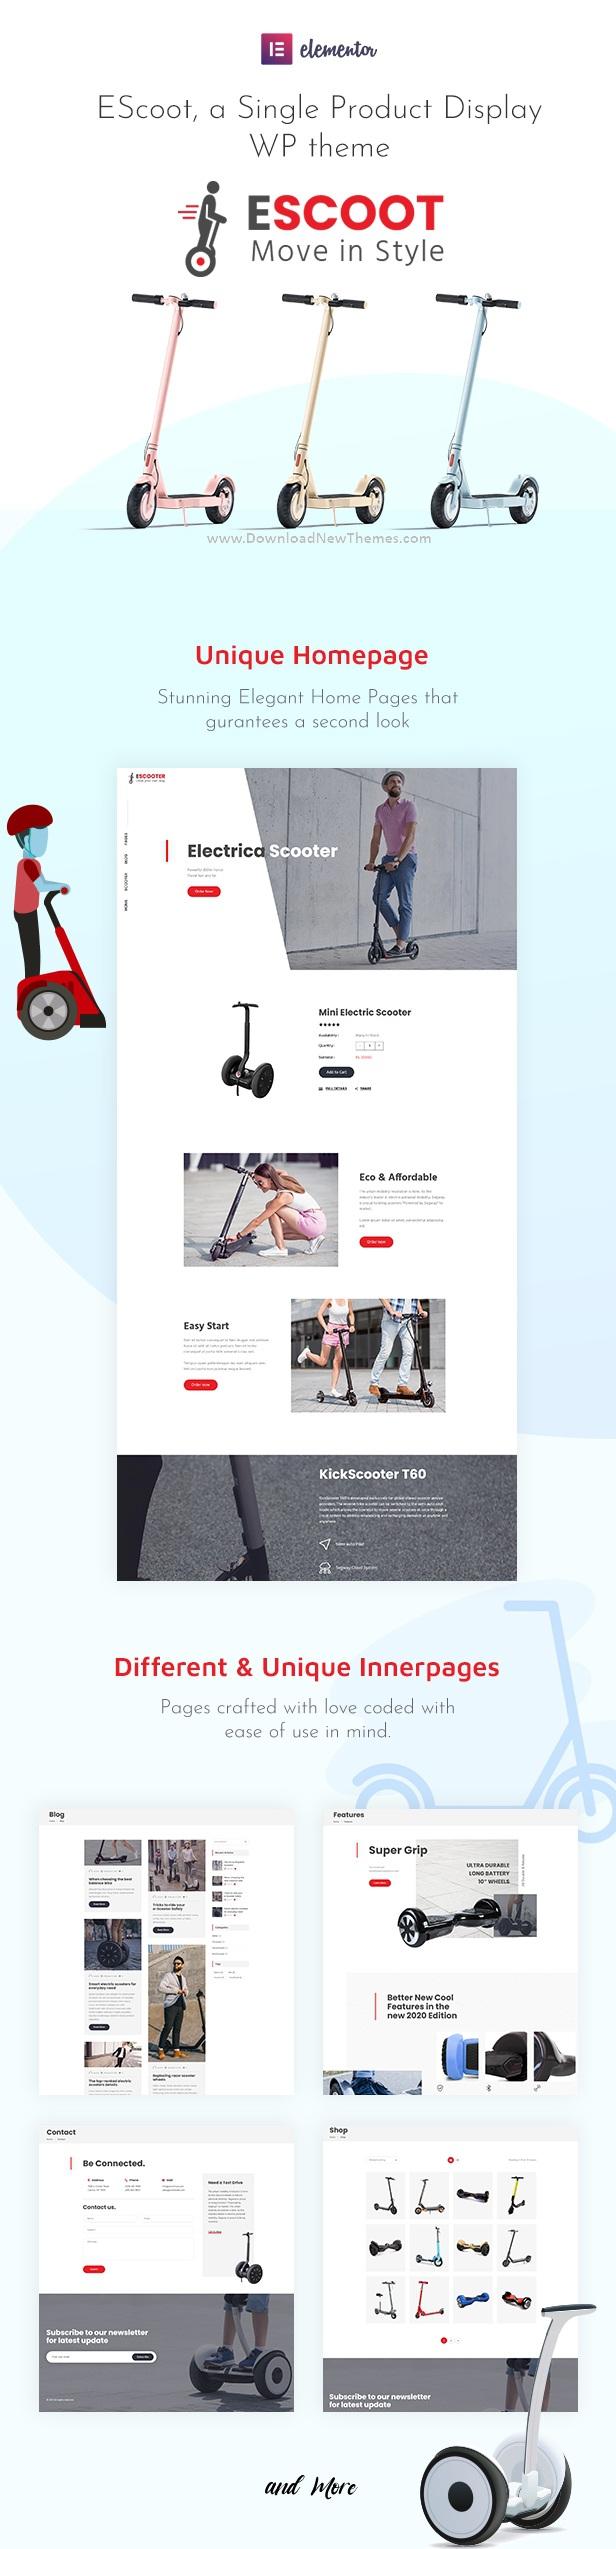 Single Product Online Store WooCommerce WordPress Theme